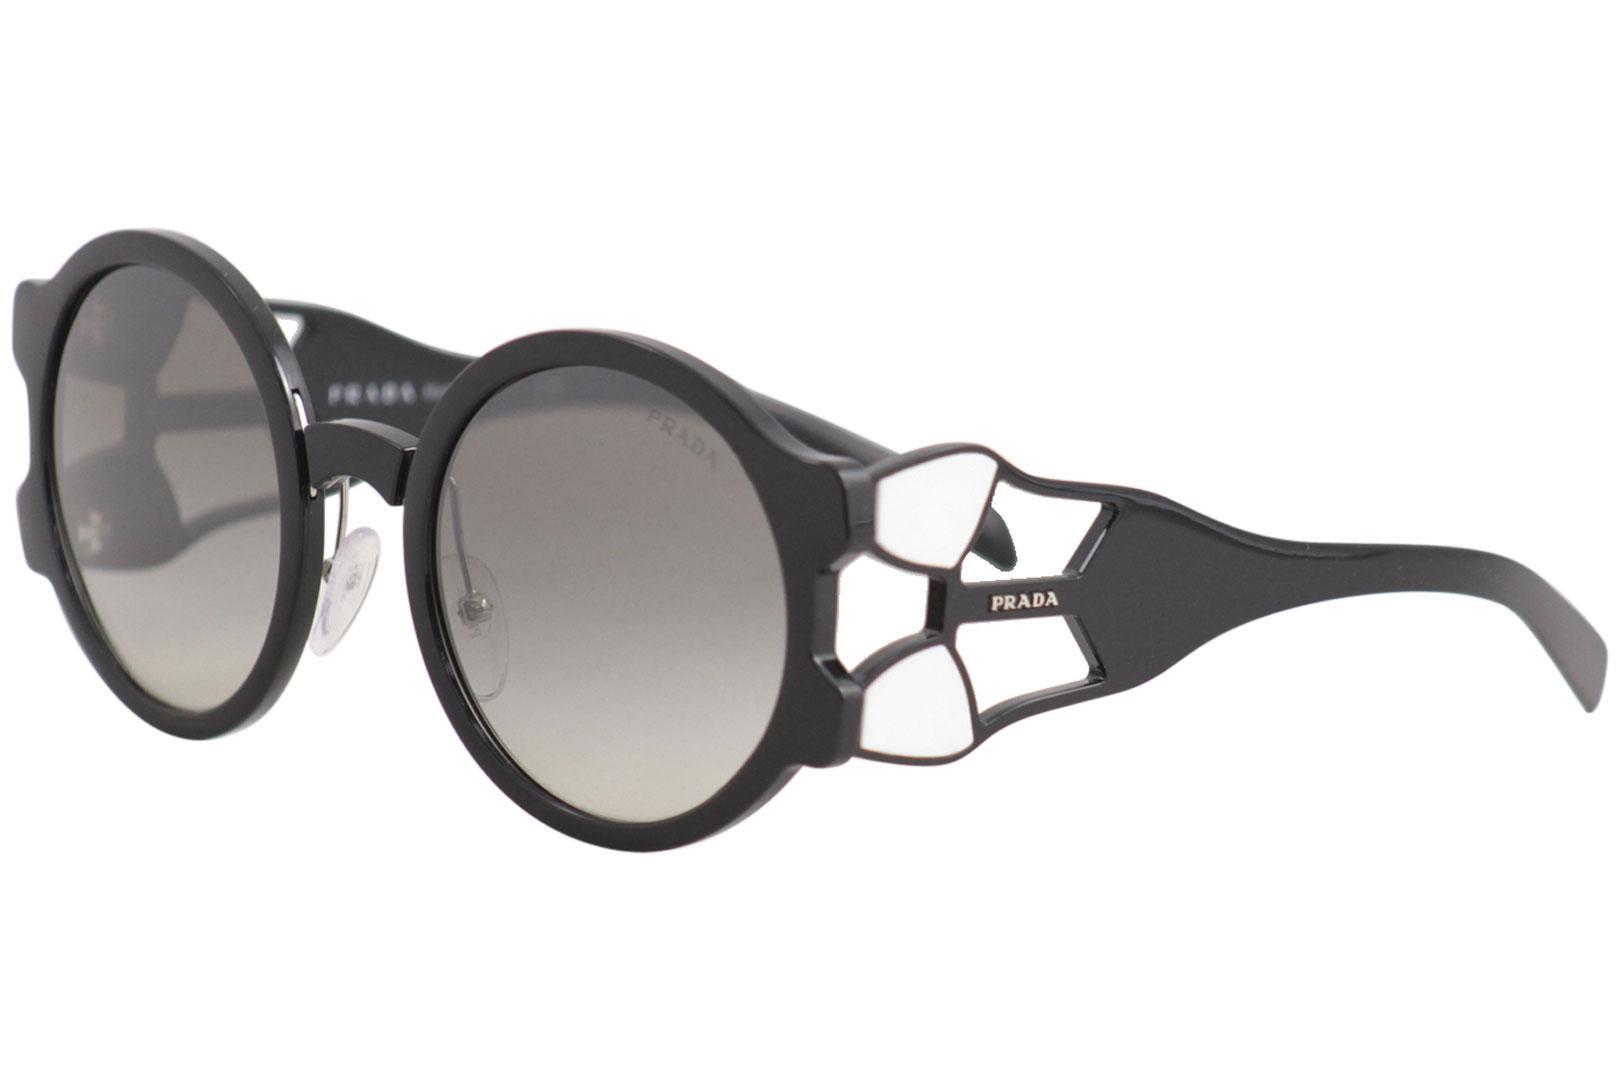 7e994e3e2d83 Prada Women s SPR13U SPR 13 U 1AB-5O0 Black Fashion Round Sunglasses ...